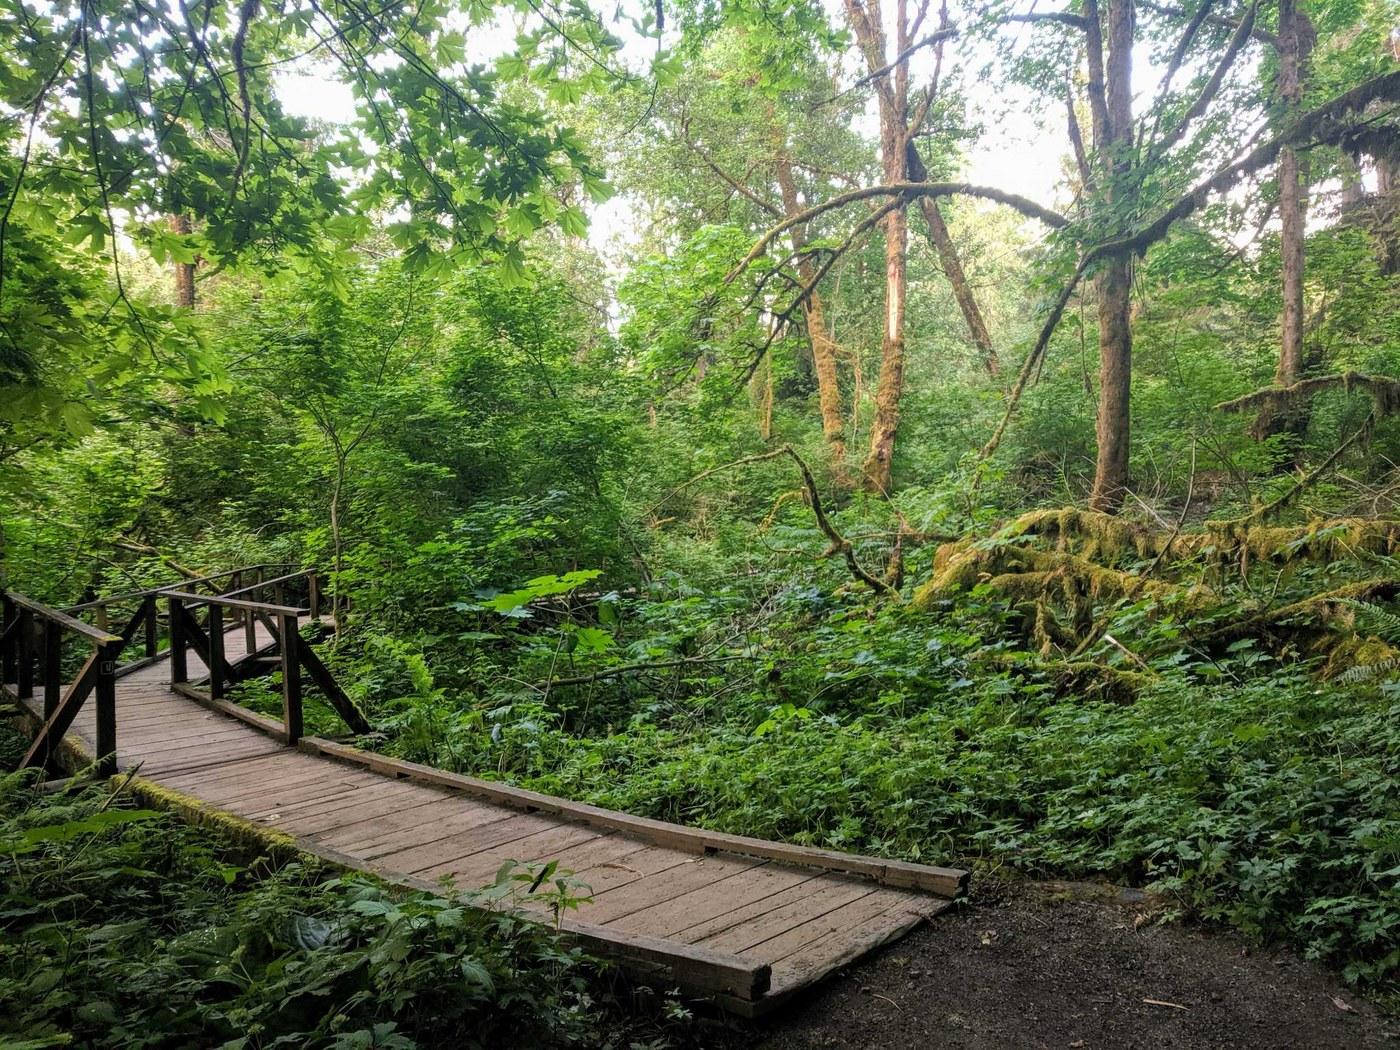 A boardwalk curves through a lush green forest. Photo by schmerica79.